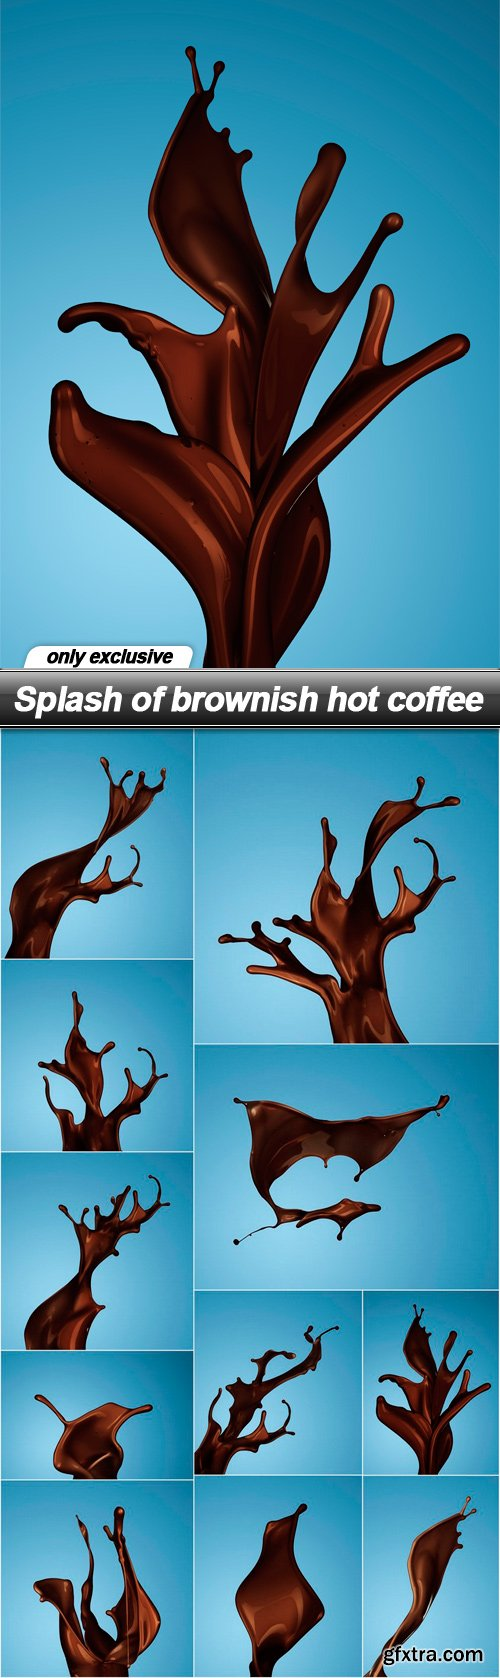 Splash of brownish hot coffee - 11 UHQ JPEG